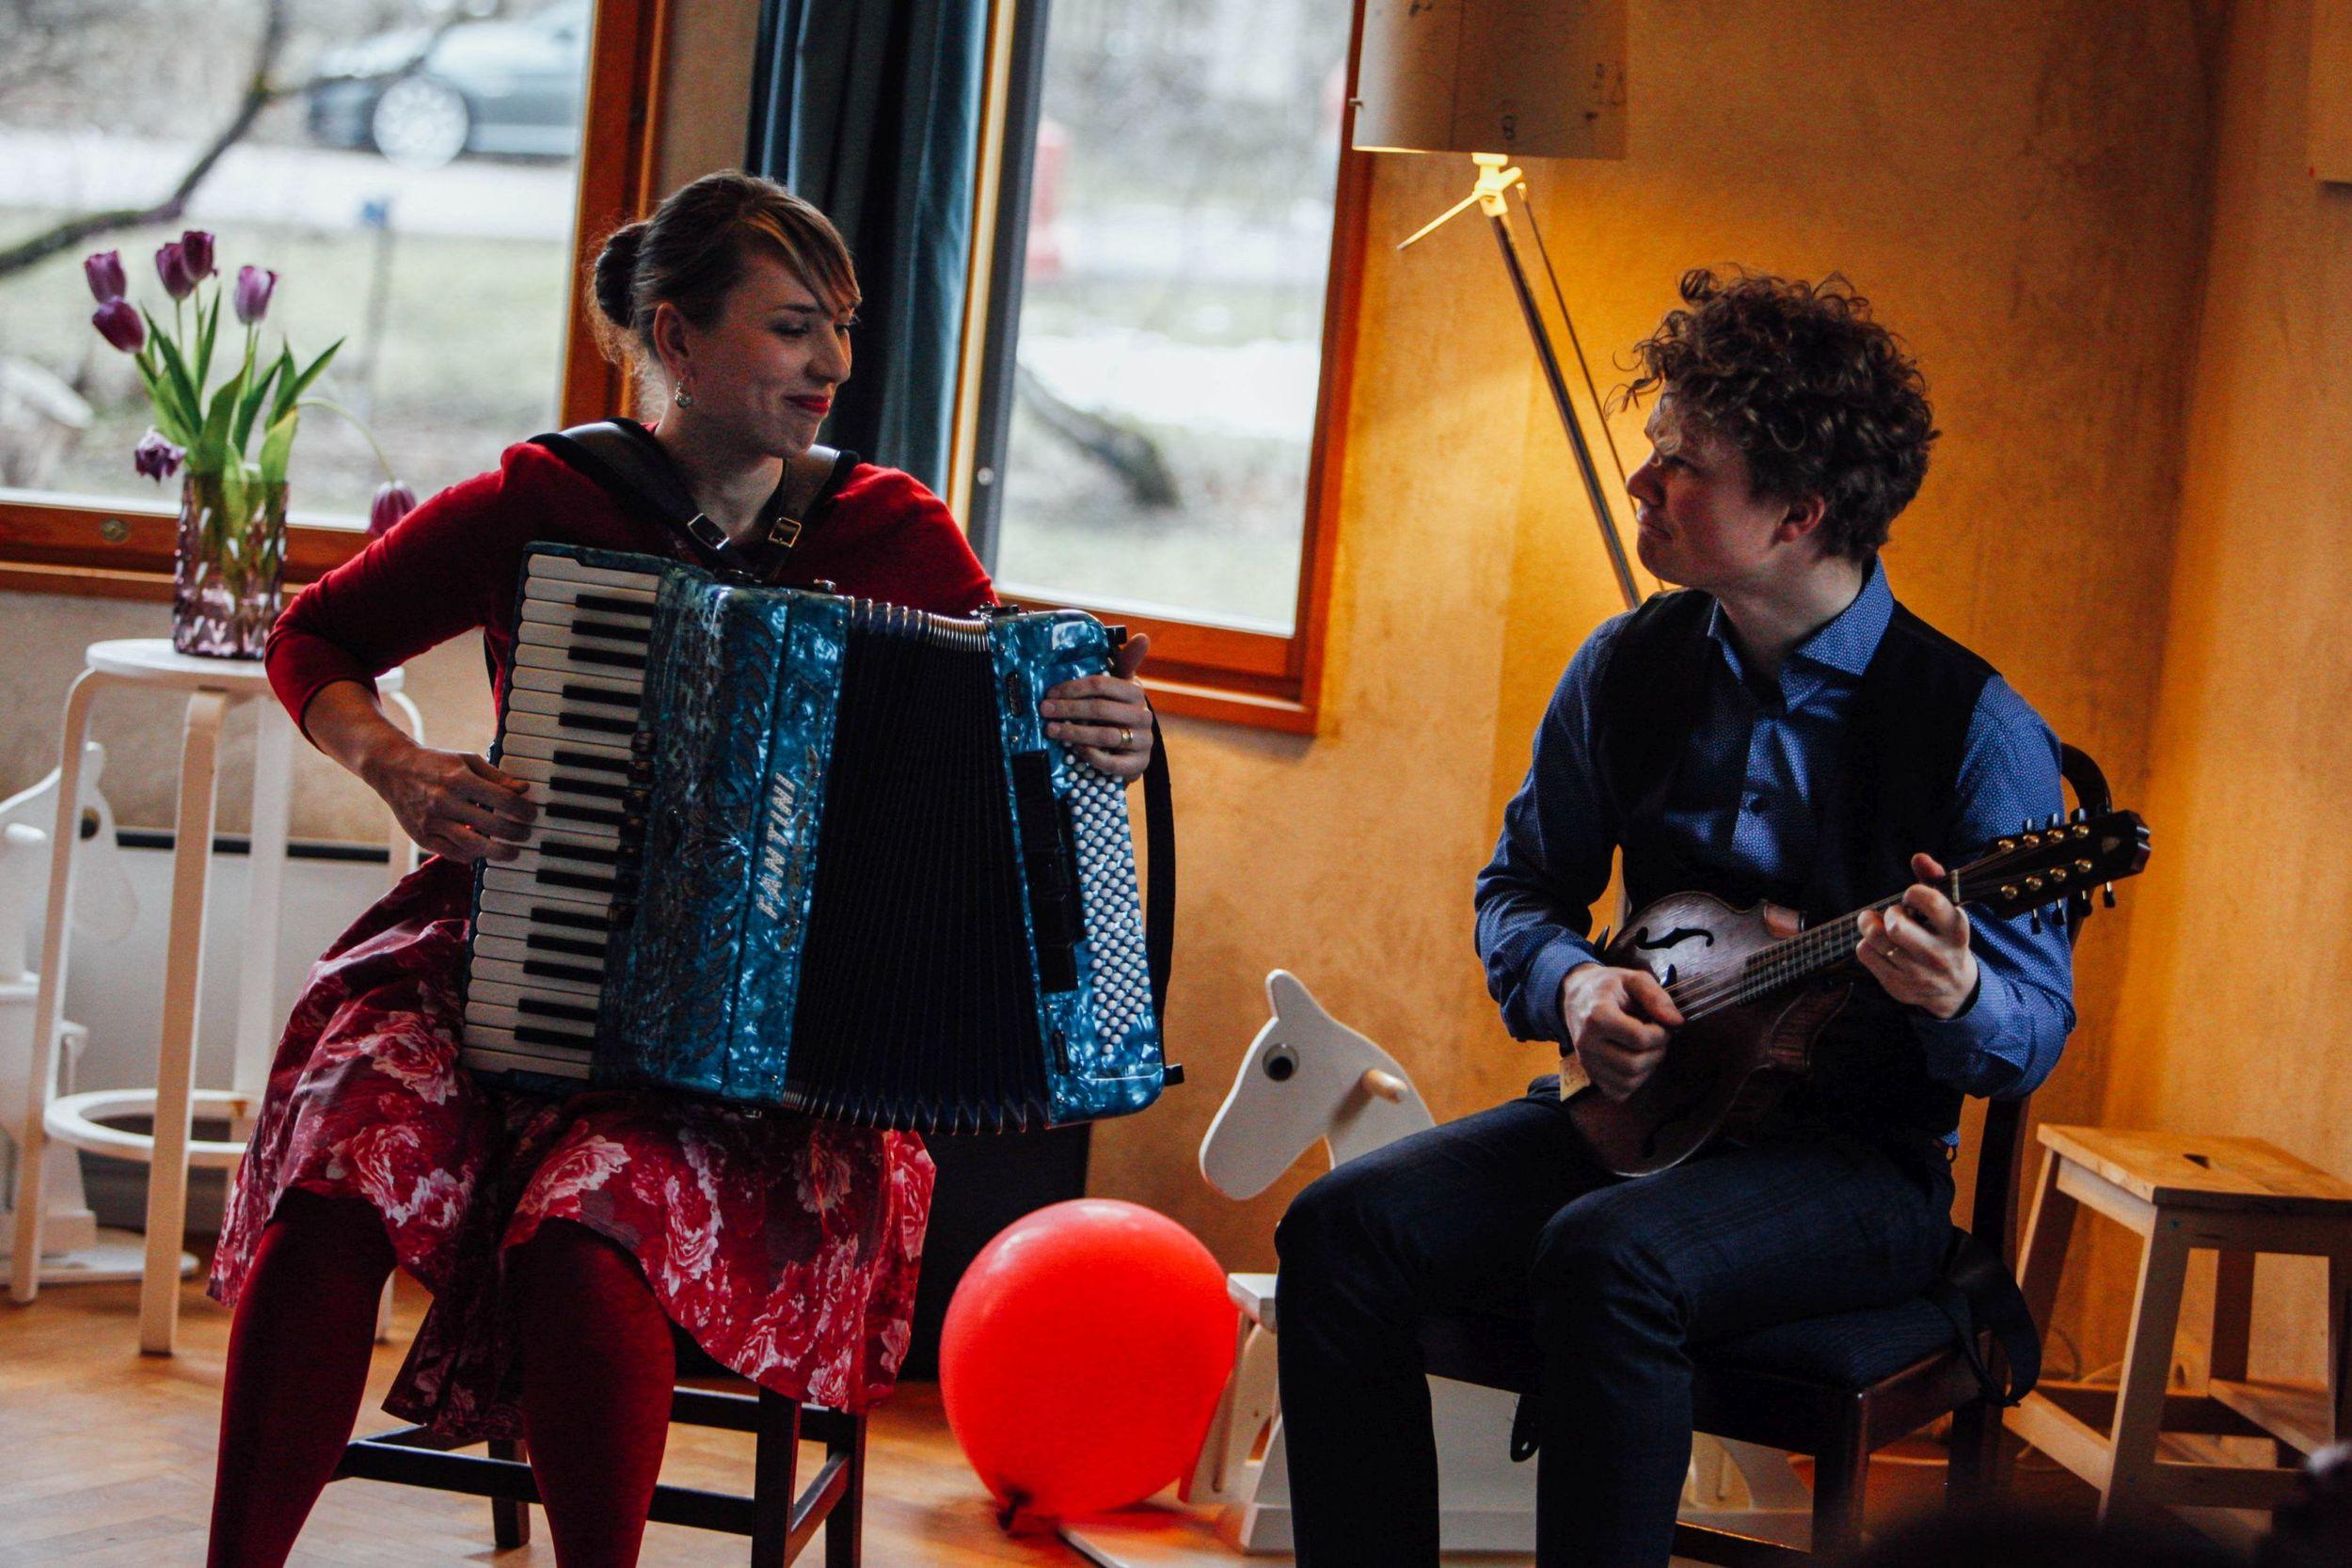 Tuulikki Bartosik Trio at Tallinn Music Week 2016 photo by Kaisa Keizars